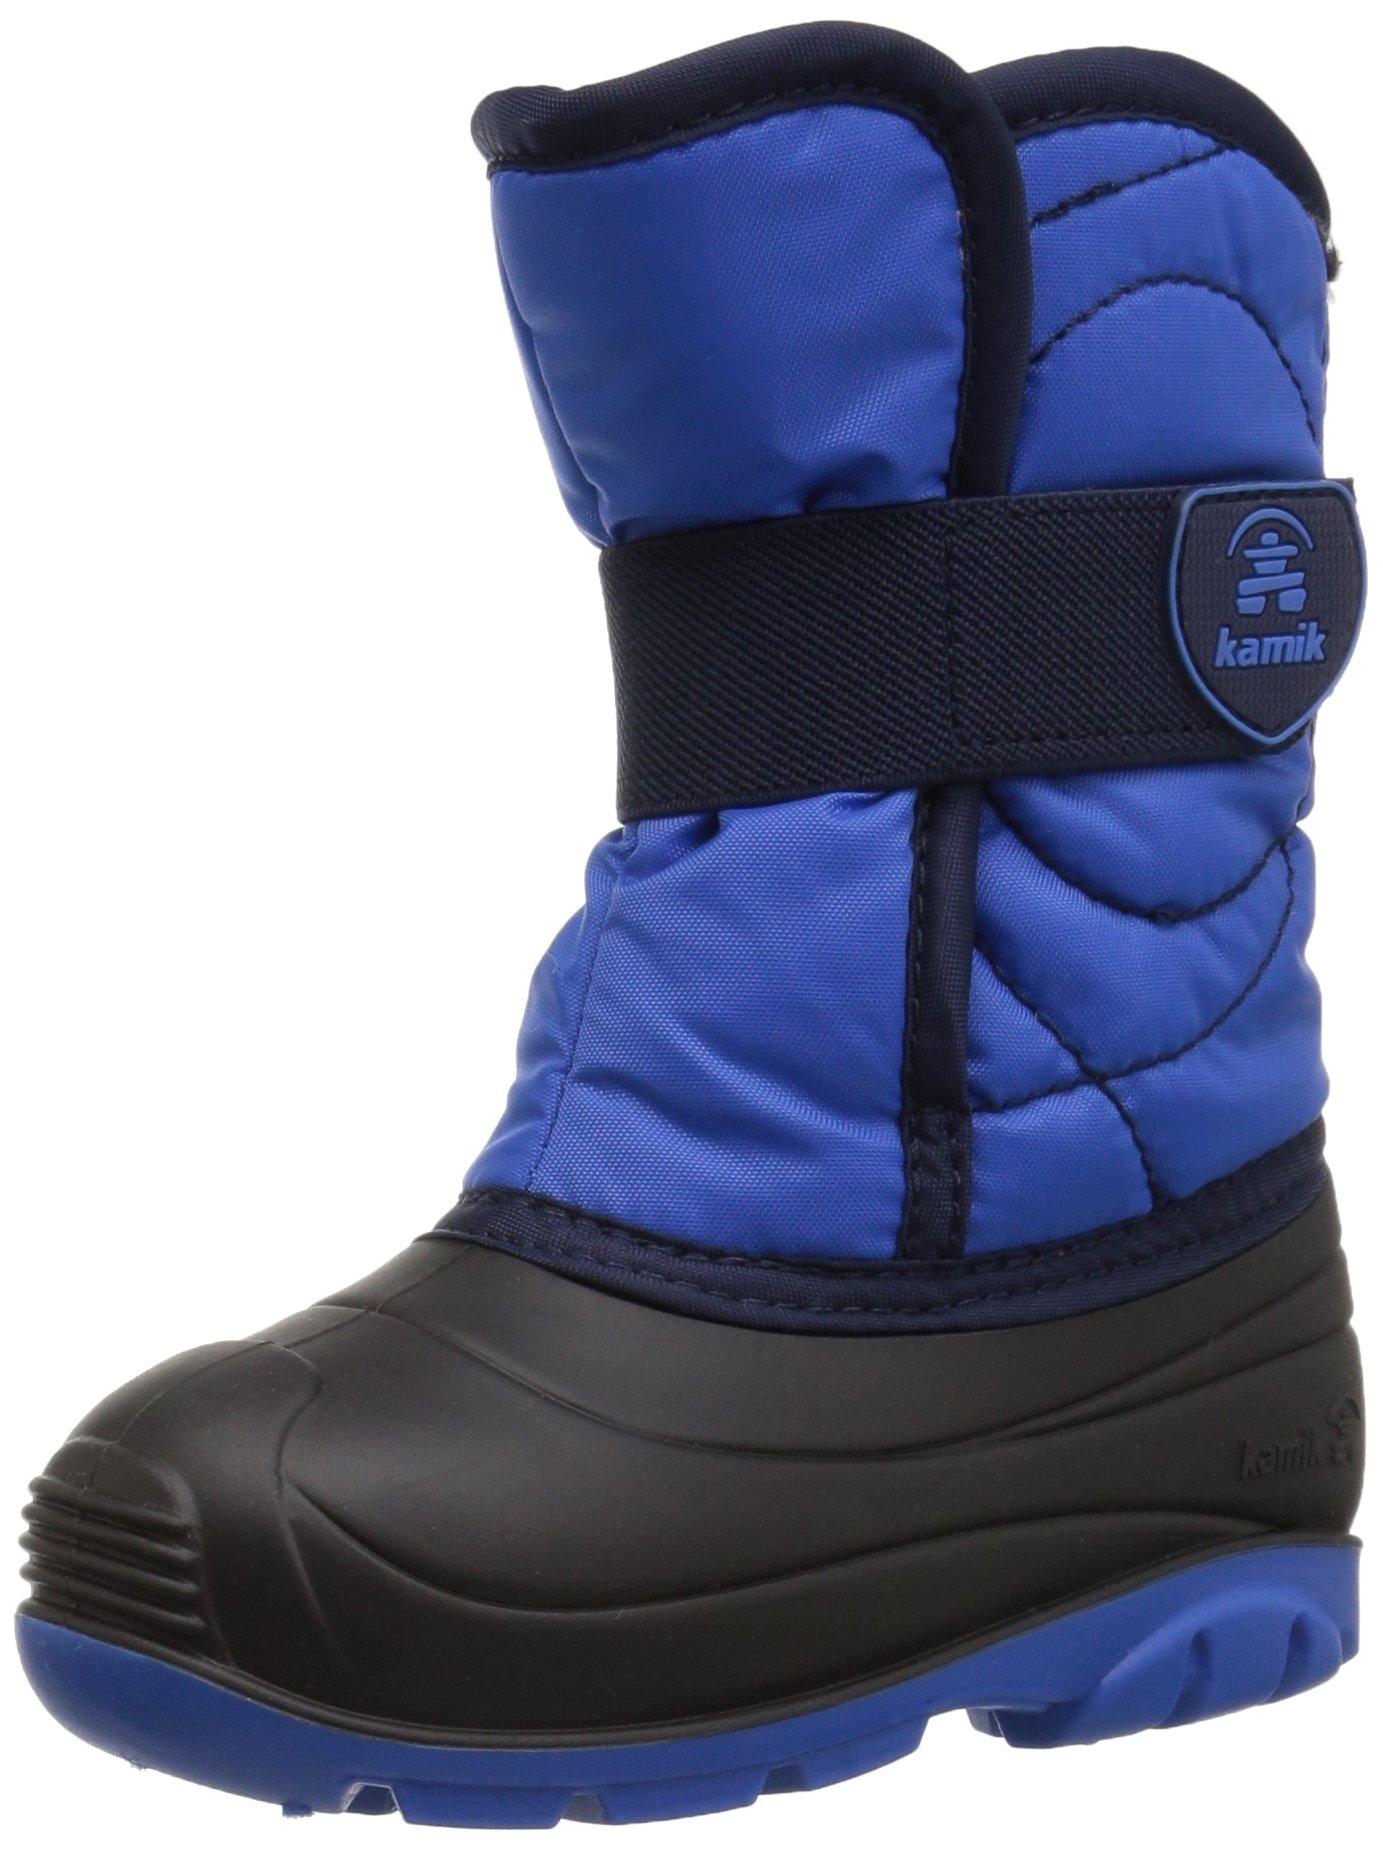 Kamik Boys' SNOWBUG3 Snow Boot, Strong Blue, 9